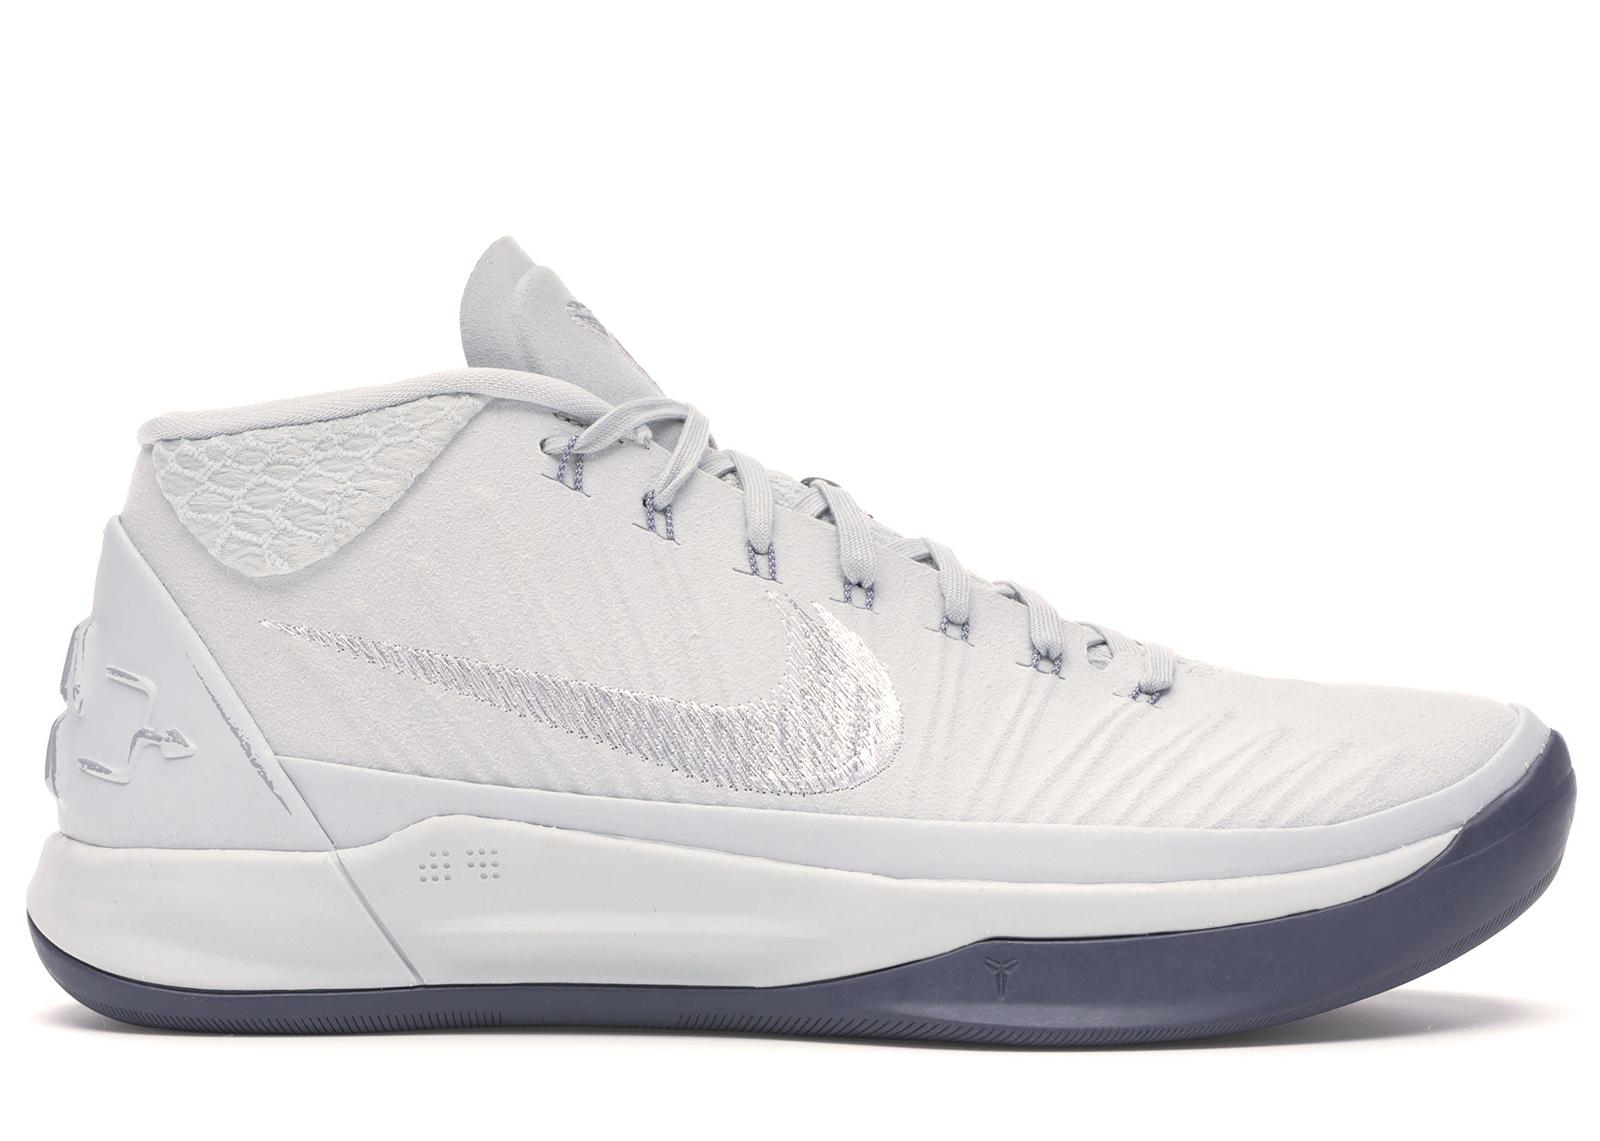 Nike Kobe A.D. Pure Platinum - 922482-004